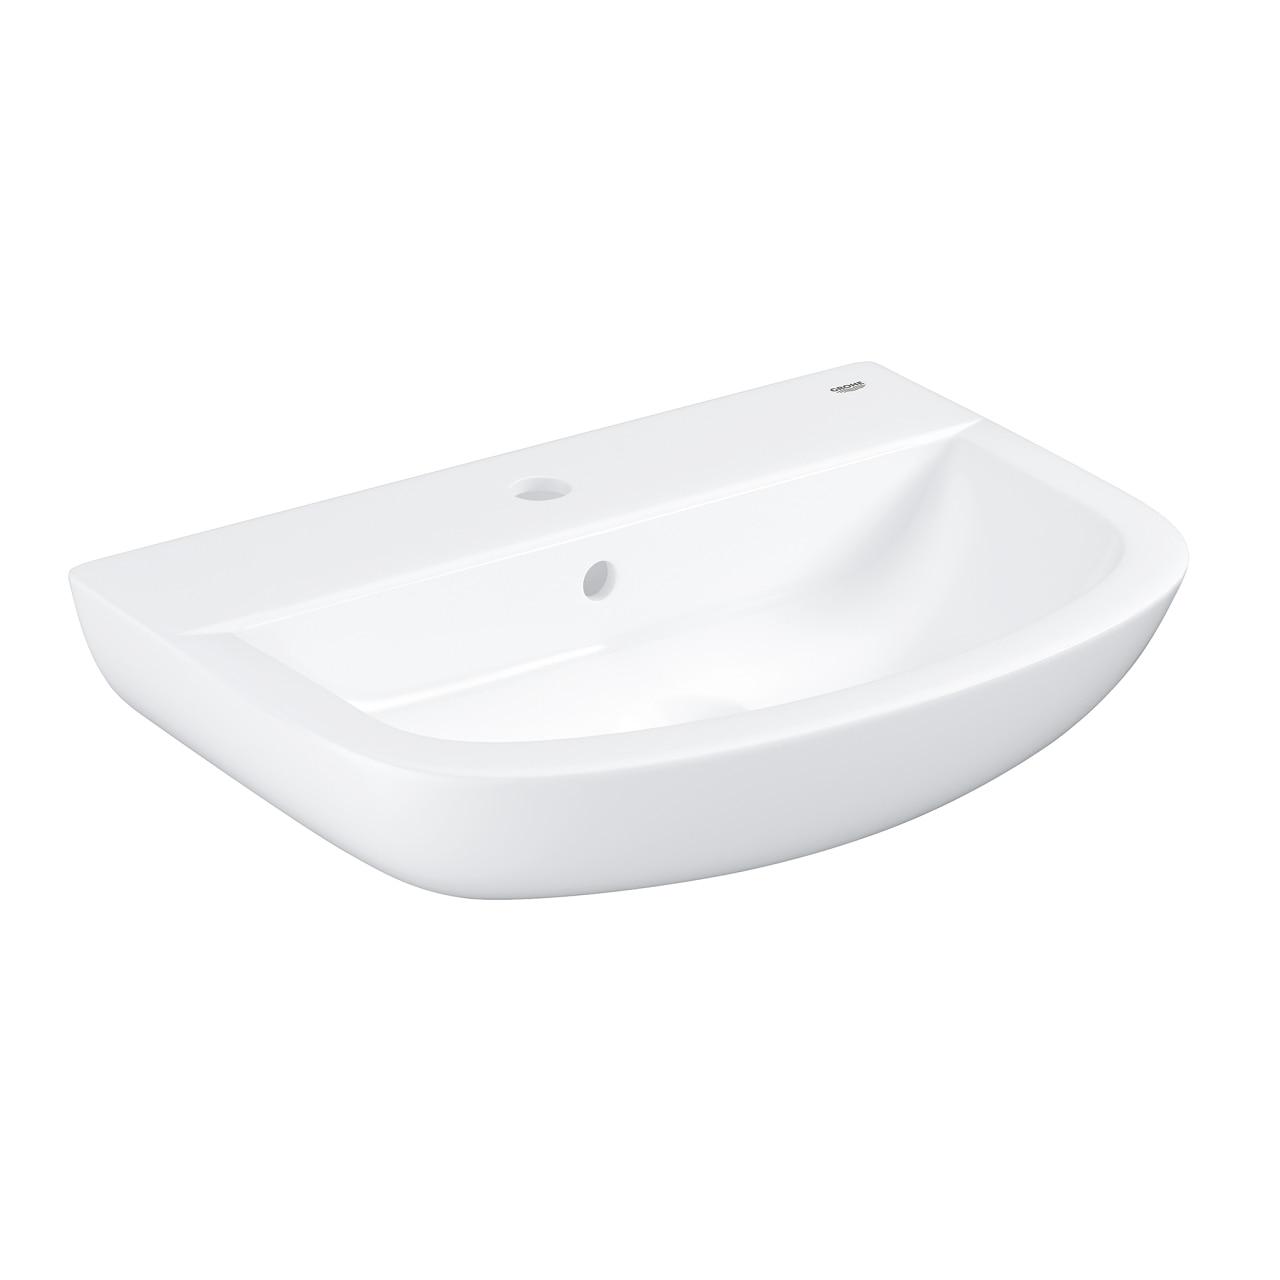 Fotografie Lavoar (chiuveta baie) Grohe Bau 39440000, preaplin, 550 x 390 mm, Alb